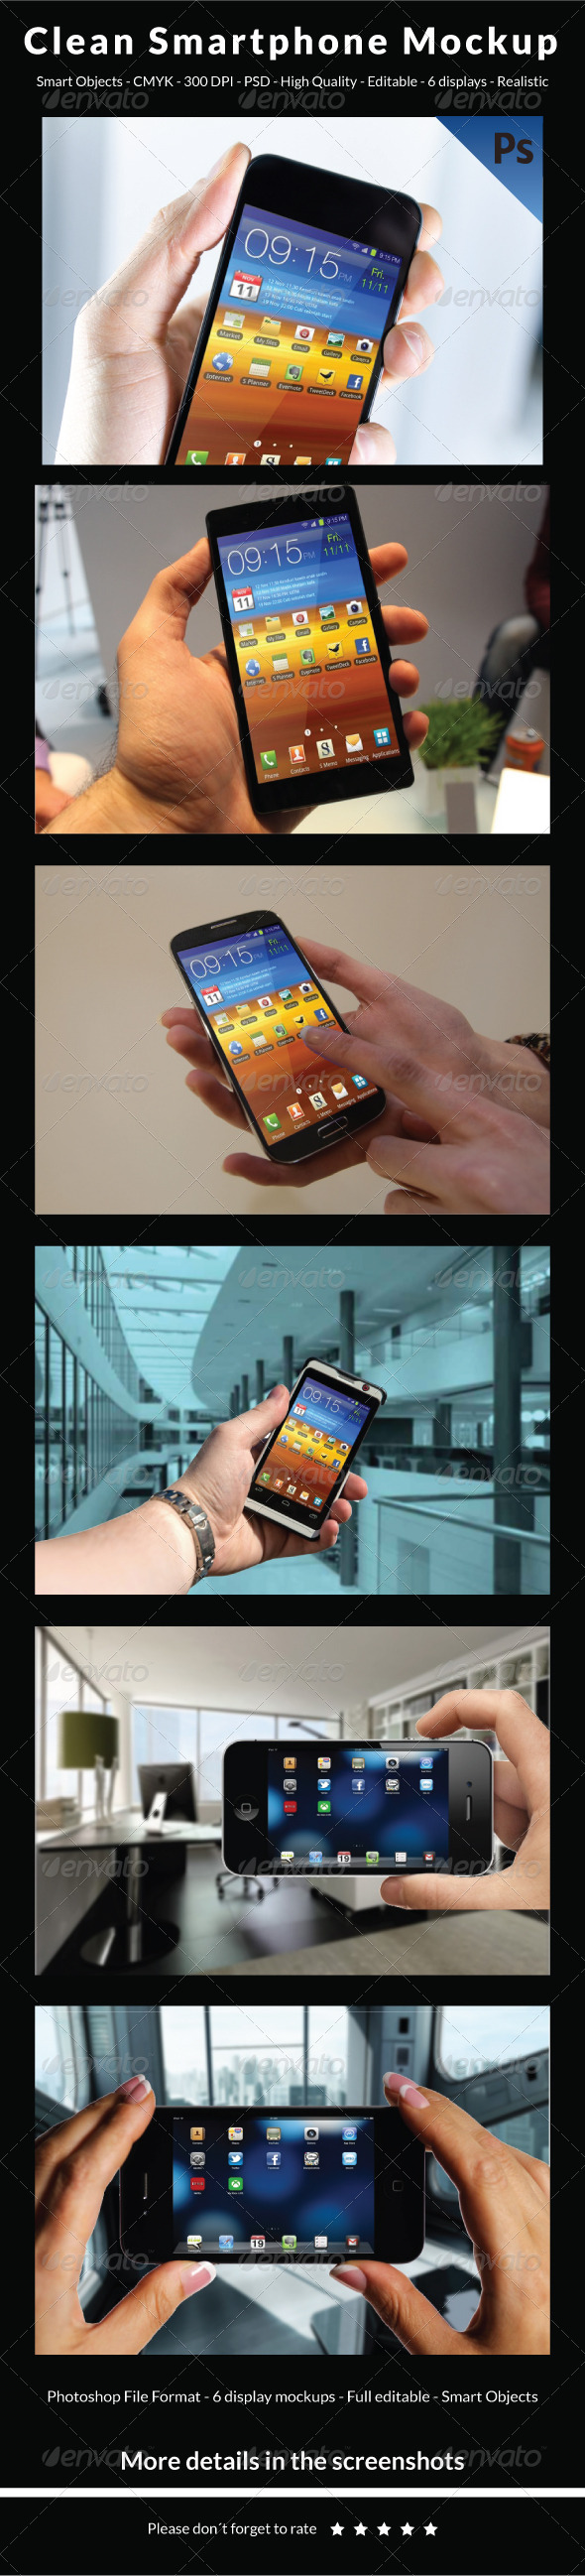 Clean Smartphone Mockup - Mobile Displays